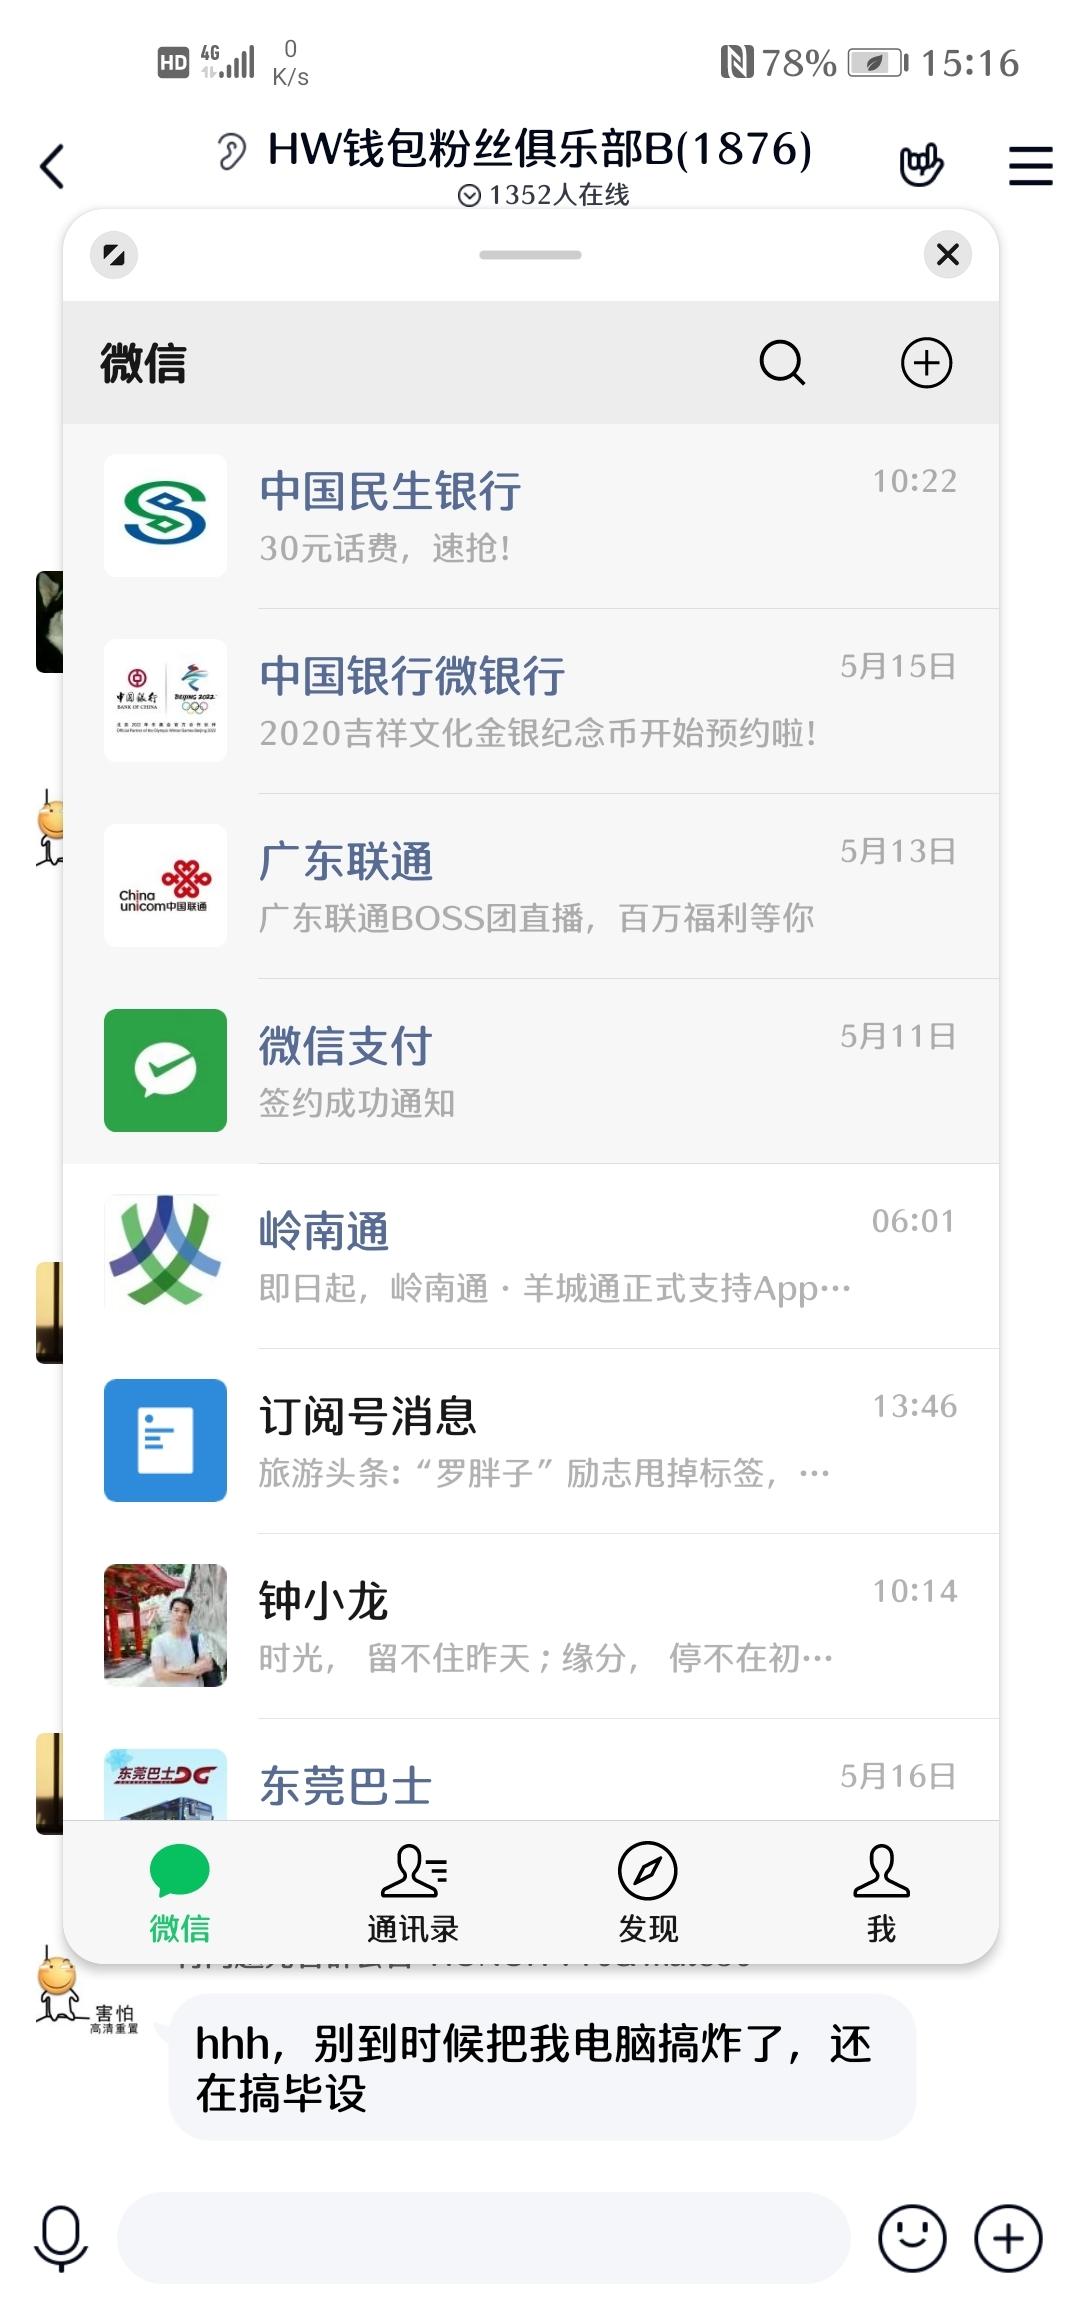 Screenshot_20200520_151657_com.tencent.mm.jpg